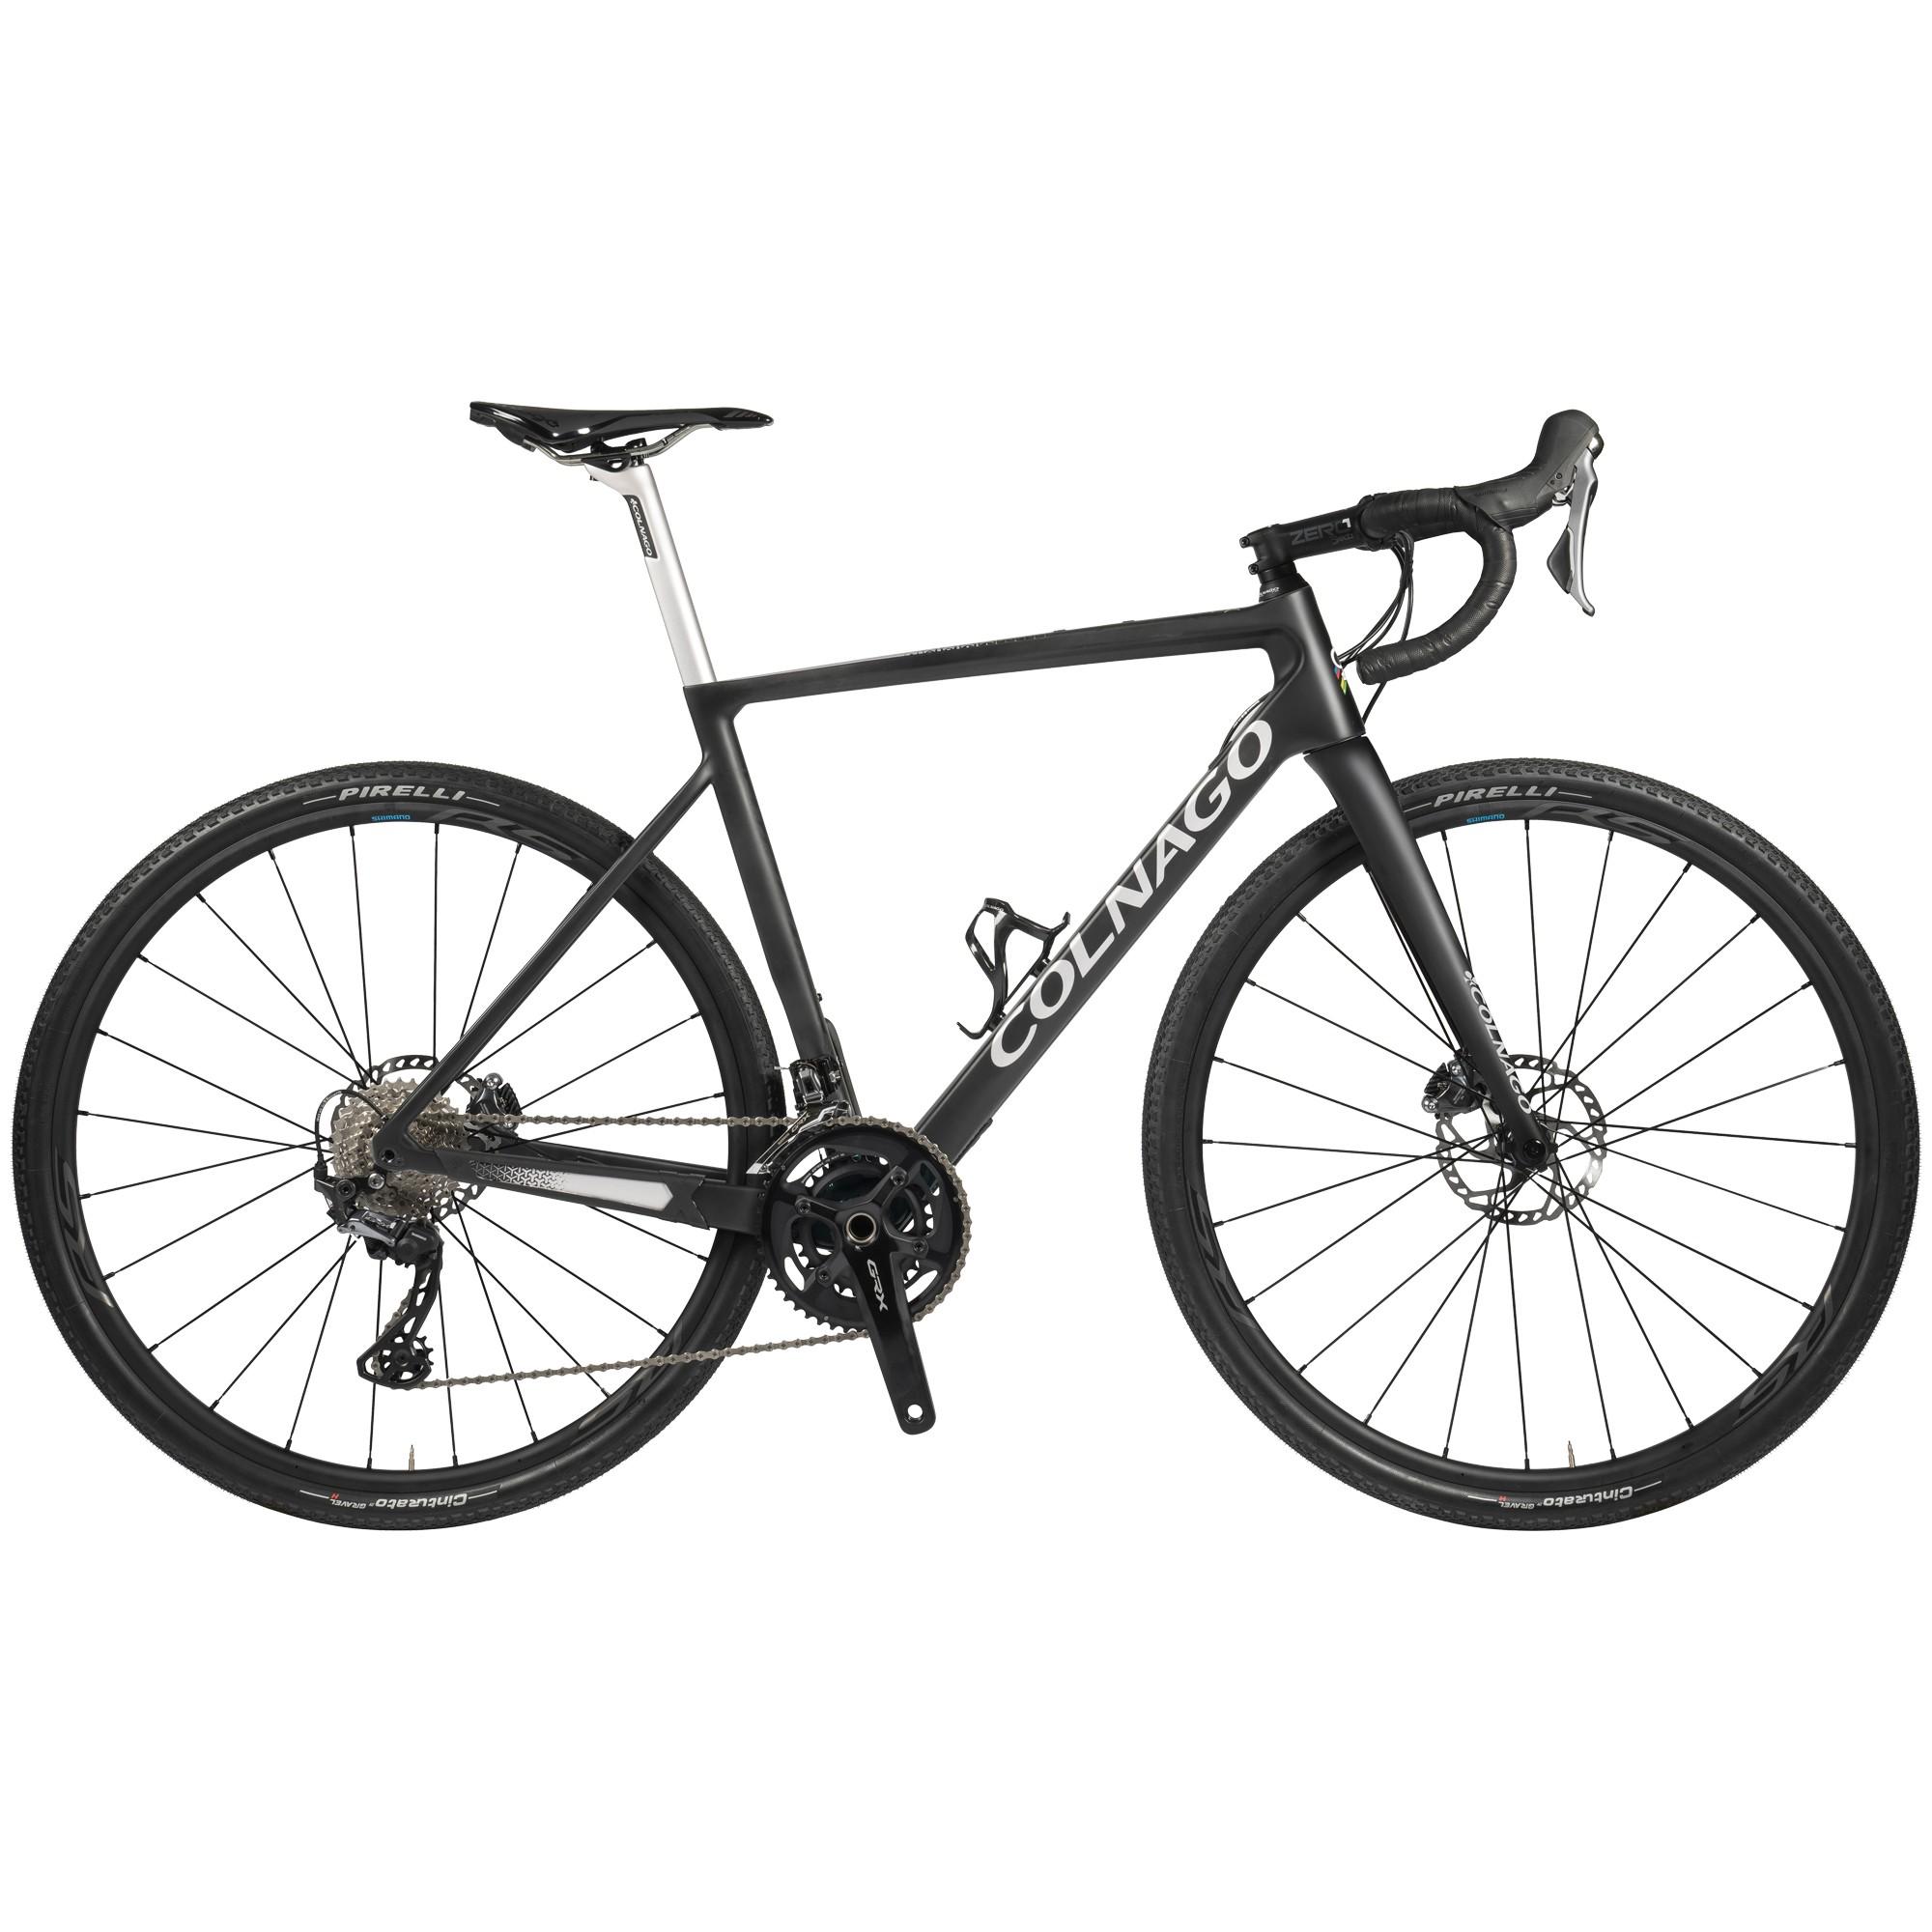 Colnago-G3X-Disc-Adventure-Road-Bike-2020-Carbon-Black-White